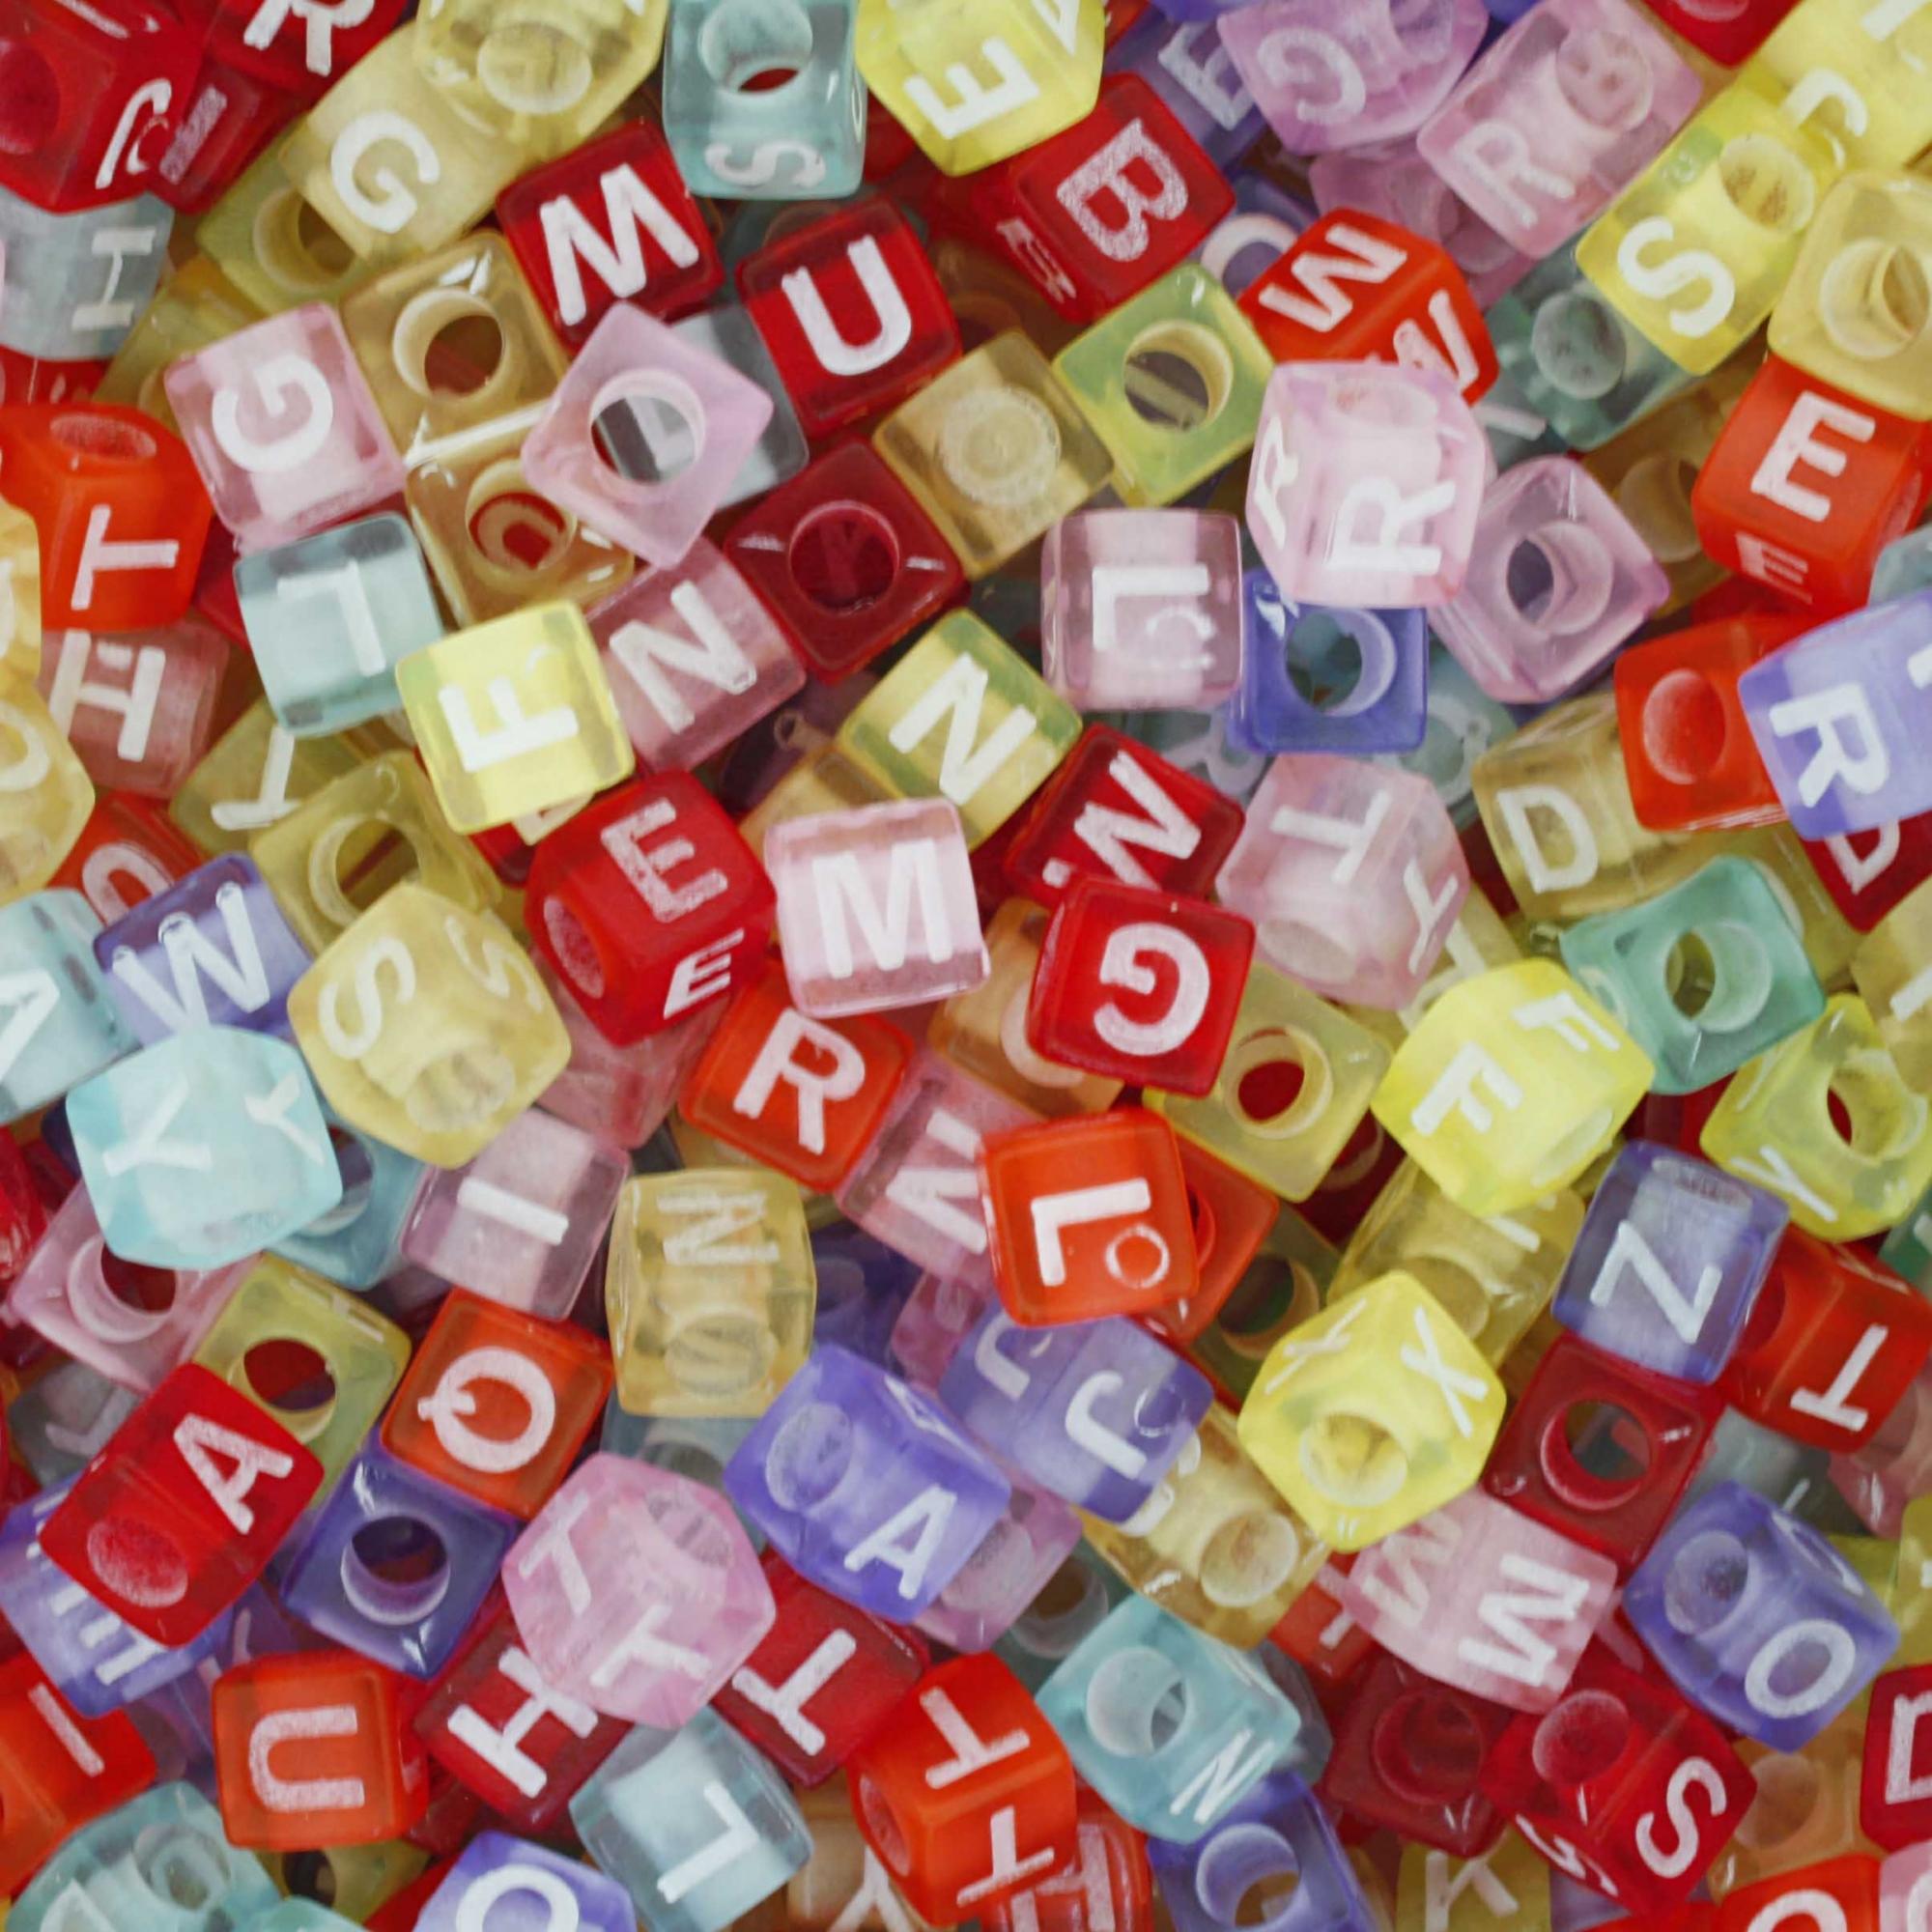 Miçanga - Letras Cubo Colors  - Stéphanie Bijoux® - Peças para Bijuterias e Artesanato